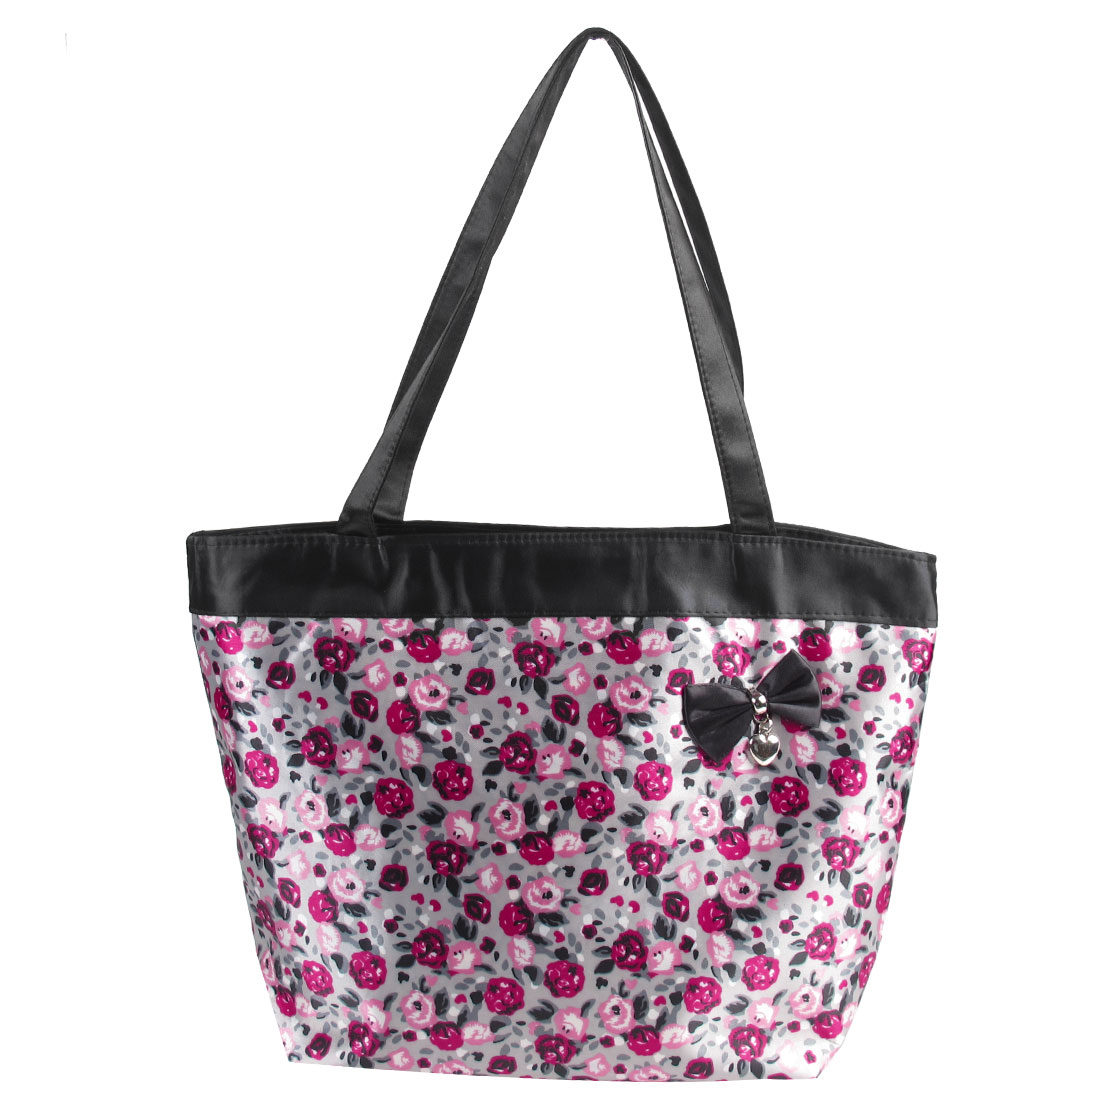 Retangle Folding Bowknot Decoration Floral Prints Gray Shopping Bag Handbag